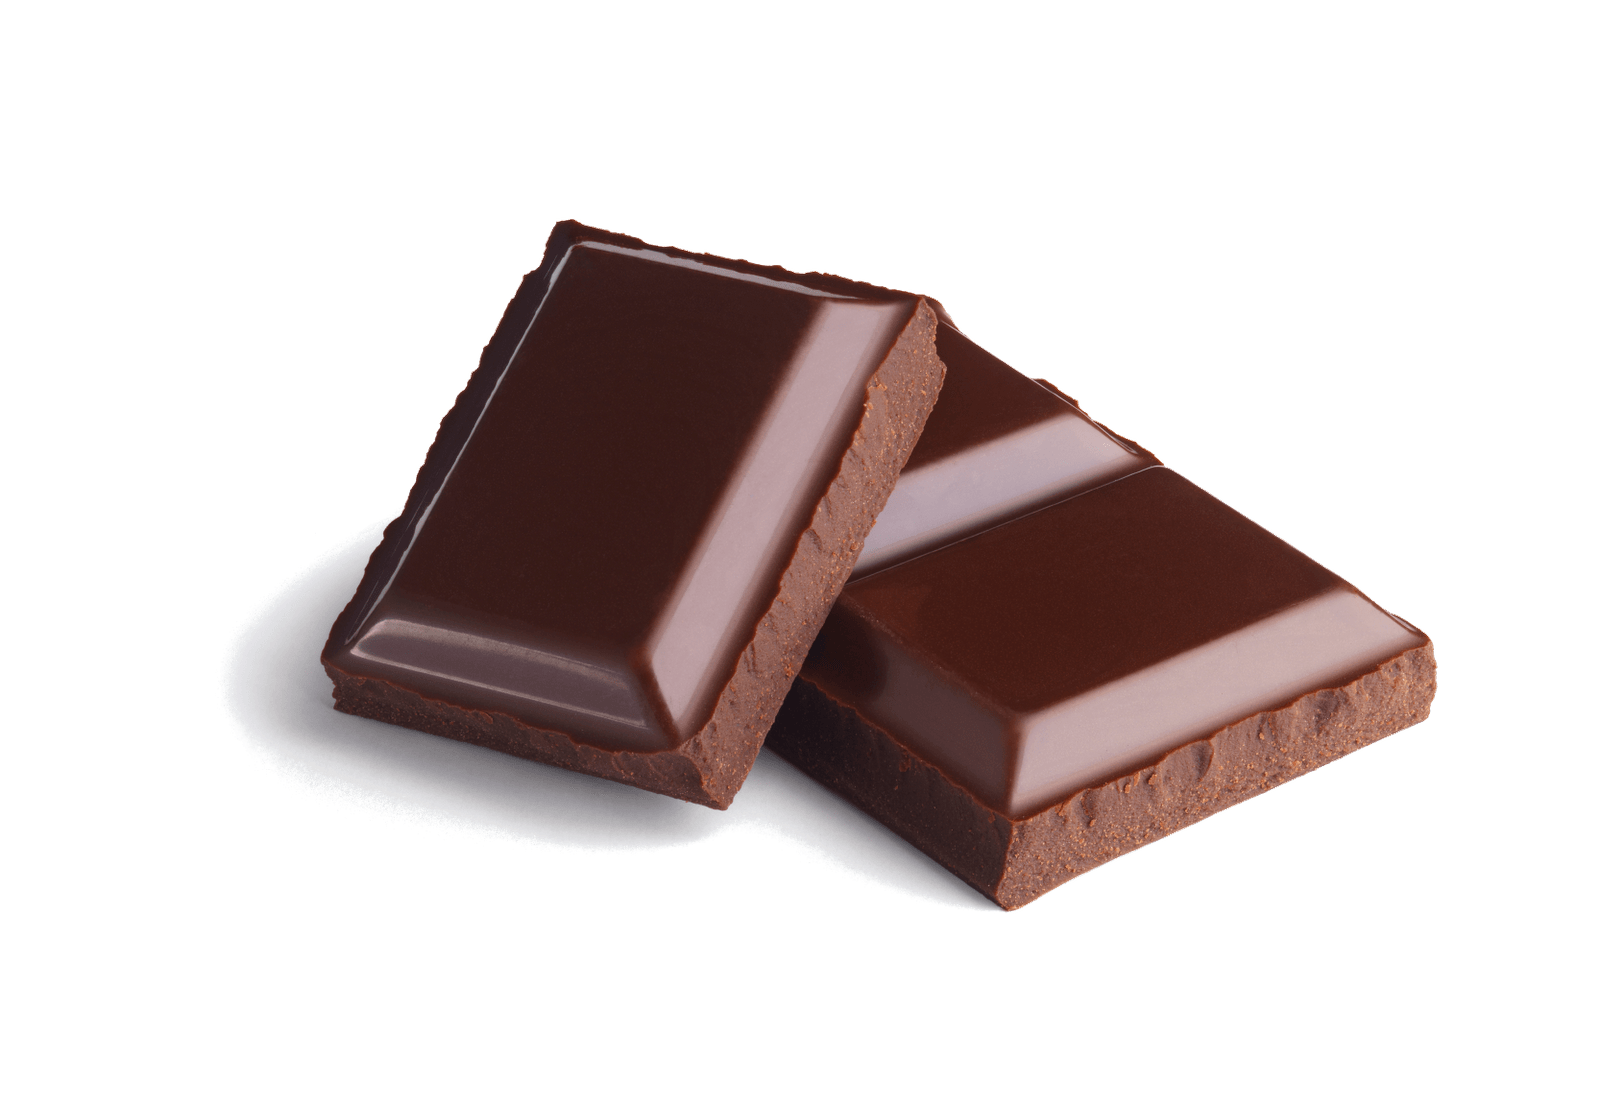 Chocolate Pieces transparent PNG - StickPNG